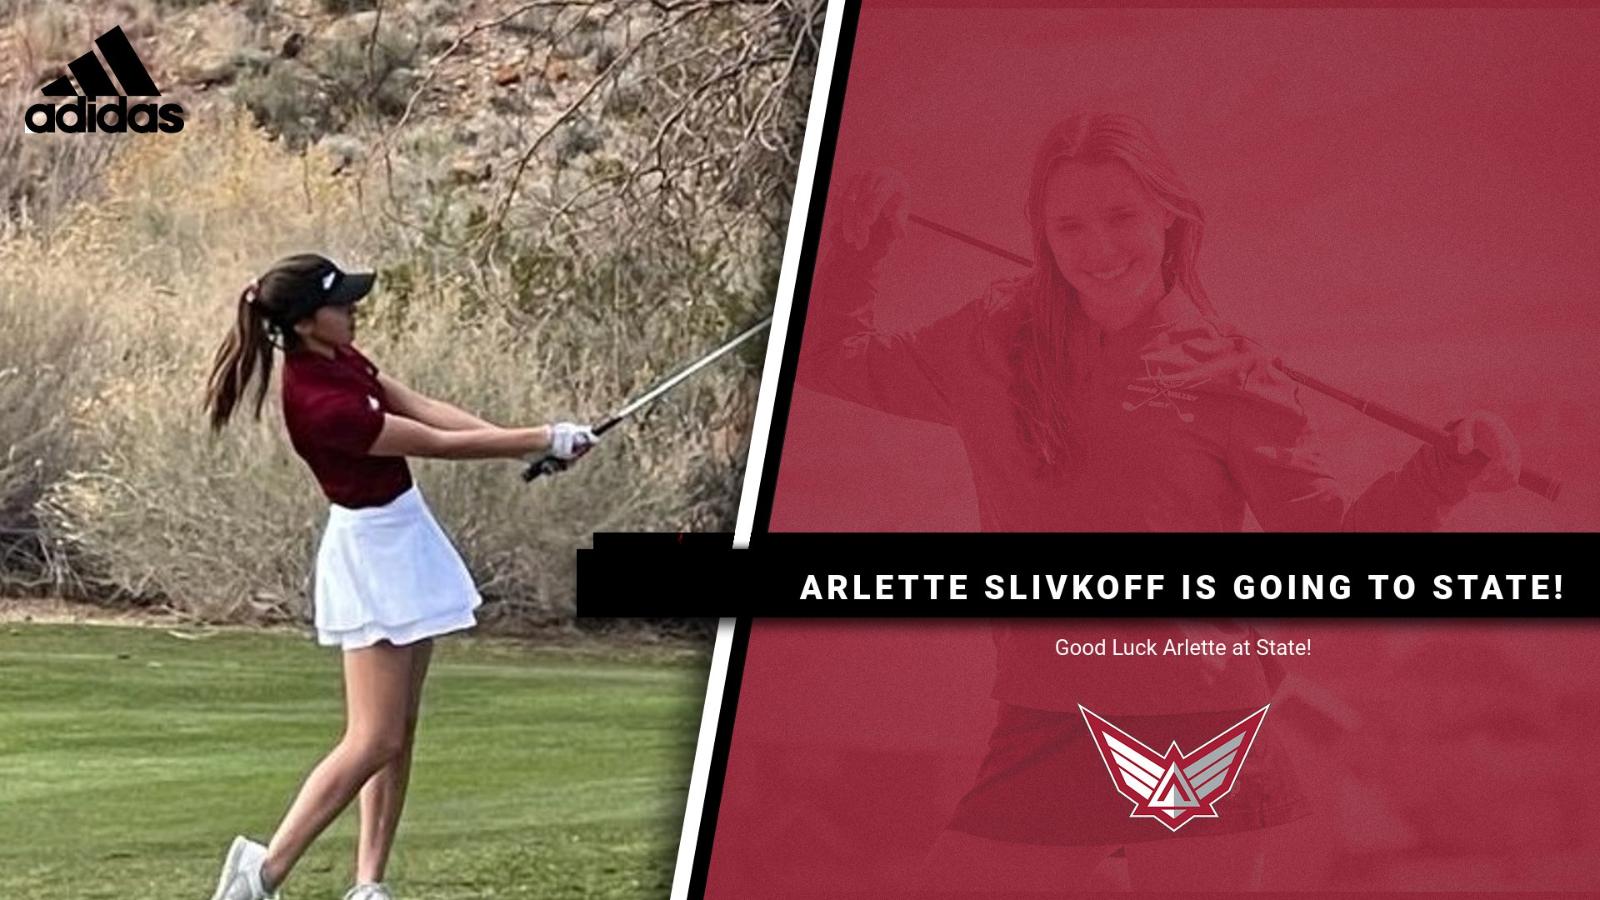 Arlette Slivkoff Qualifies for STATE!